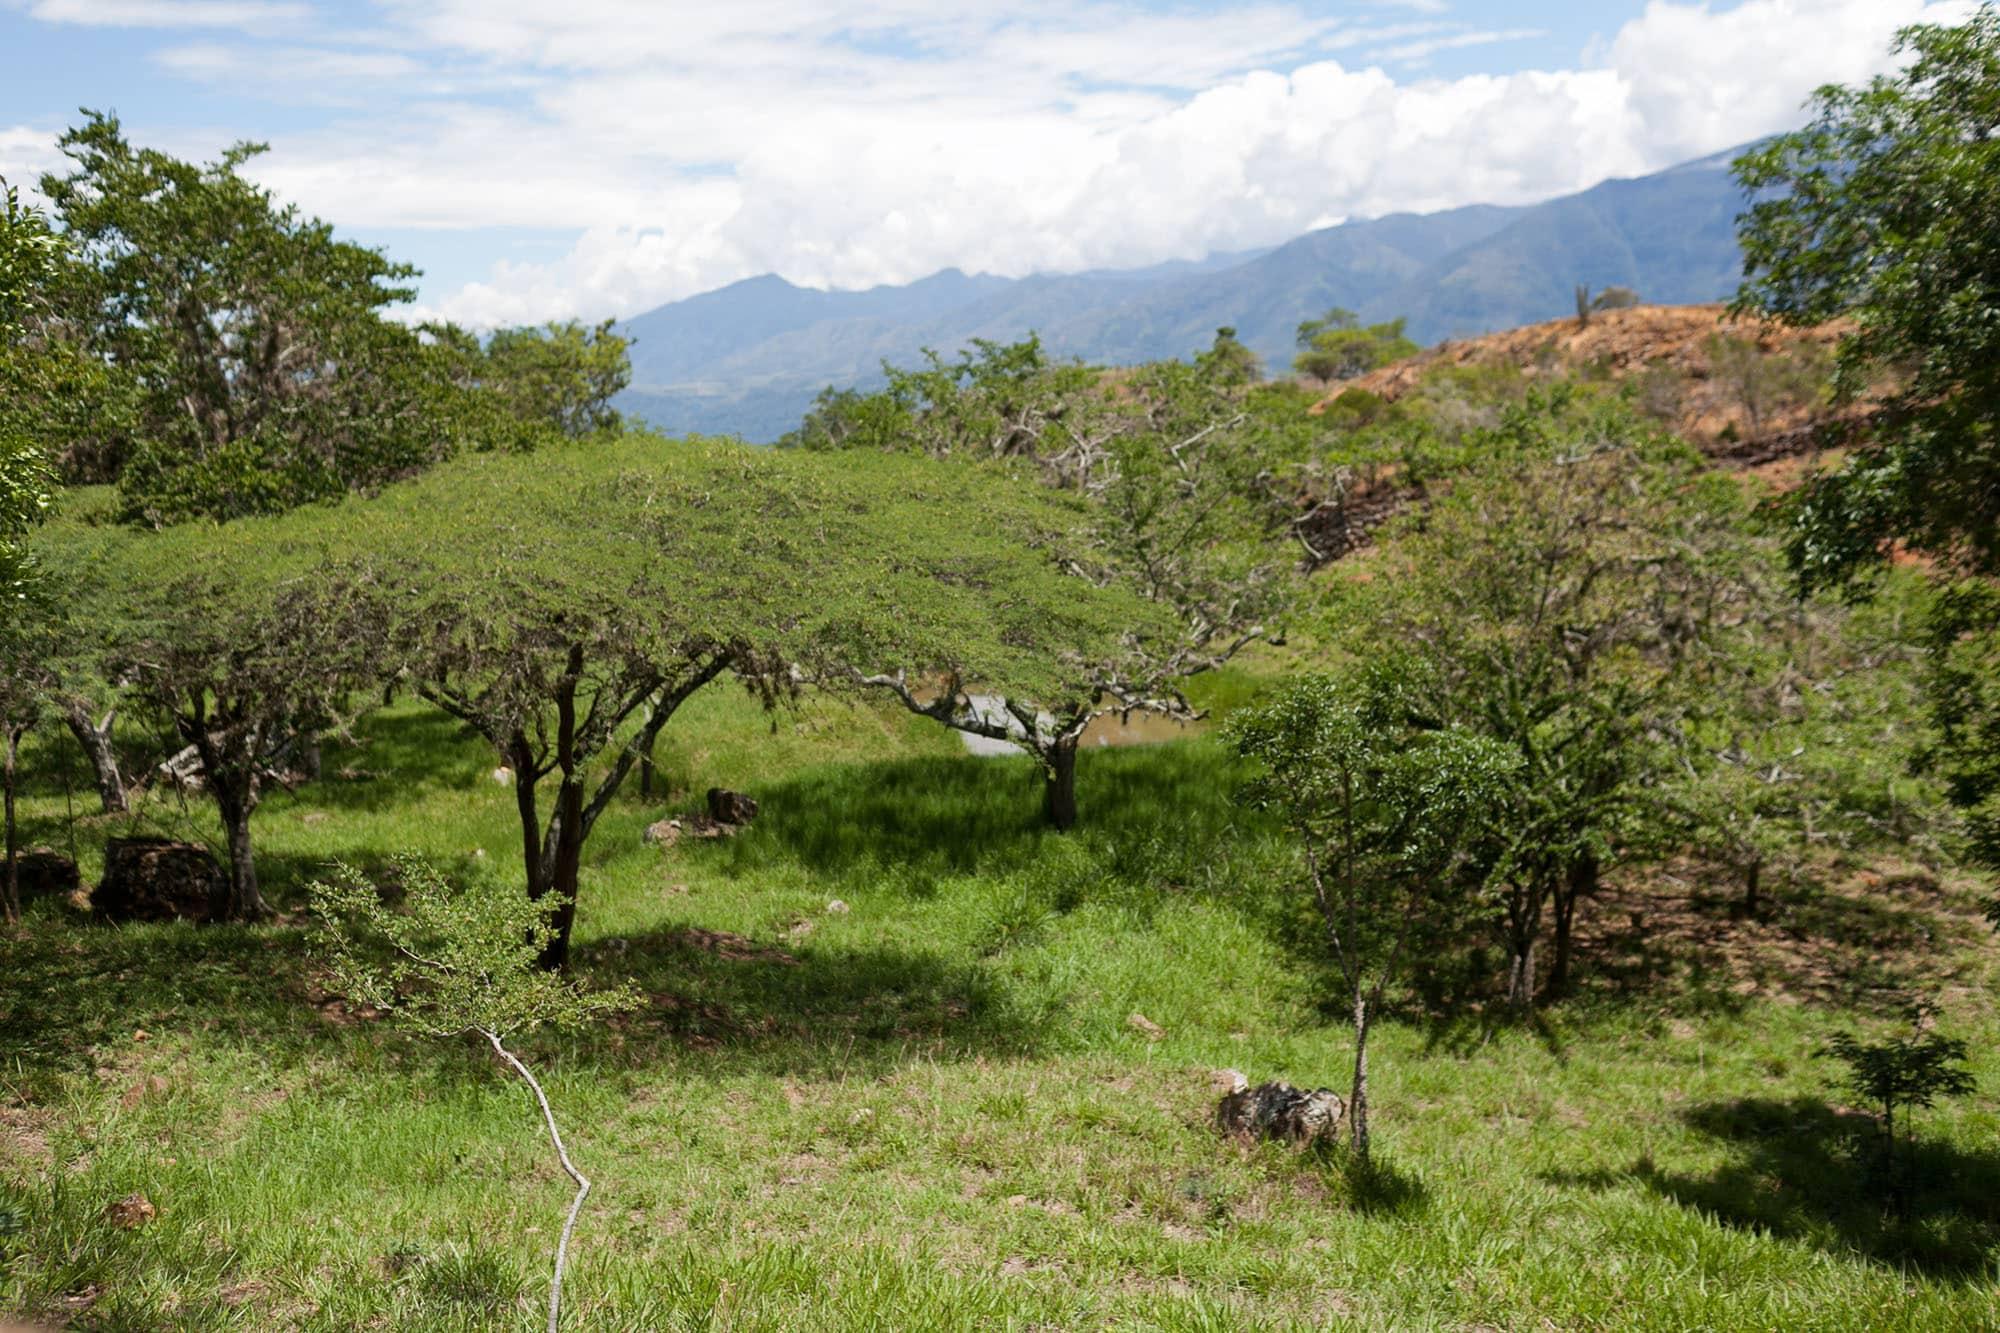 Camino Real - Barichara to Guane, Colombia